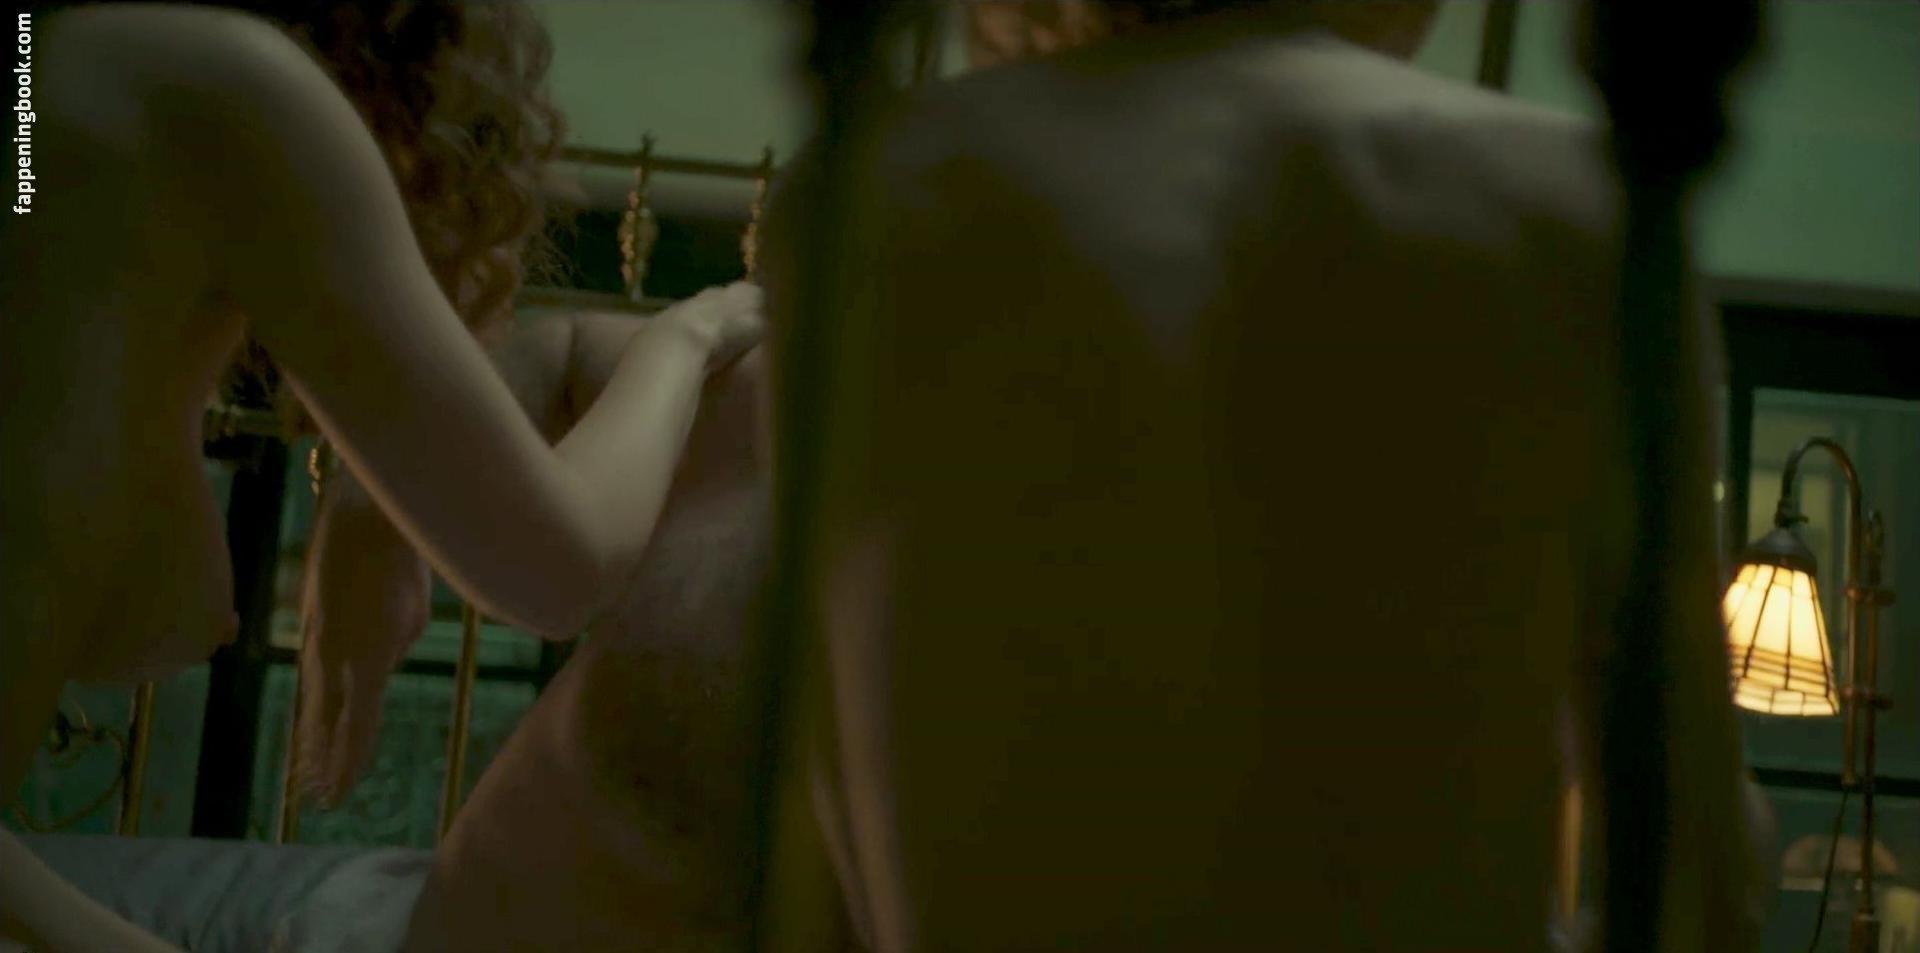 Ana Polvorosa Nude ana polvorosa nude, sexy, the fappening, uncensored - photo